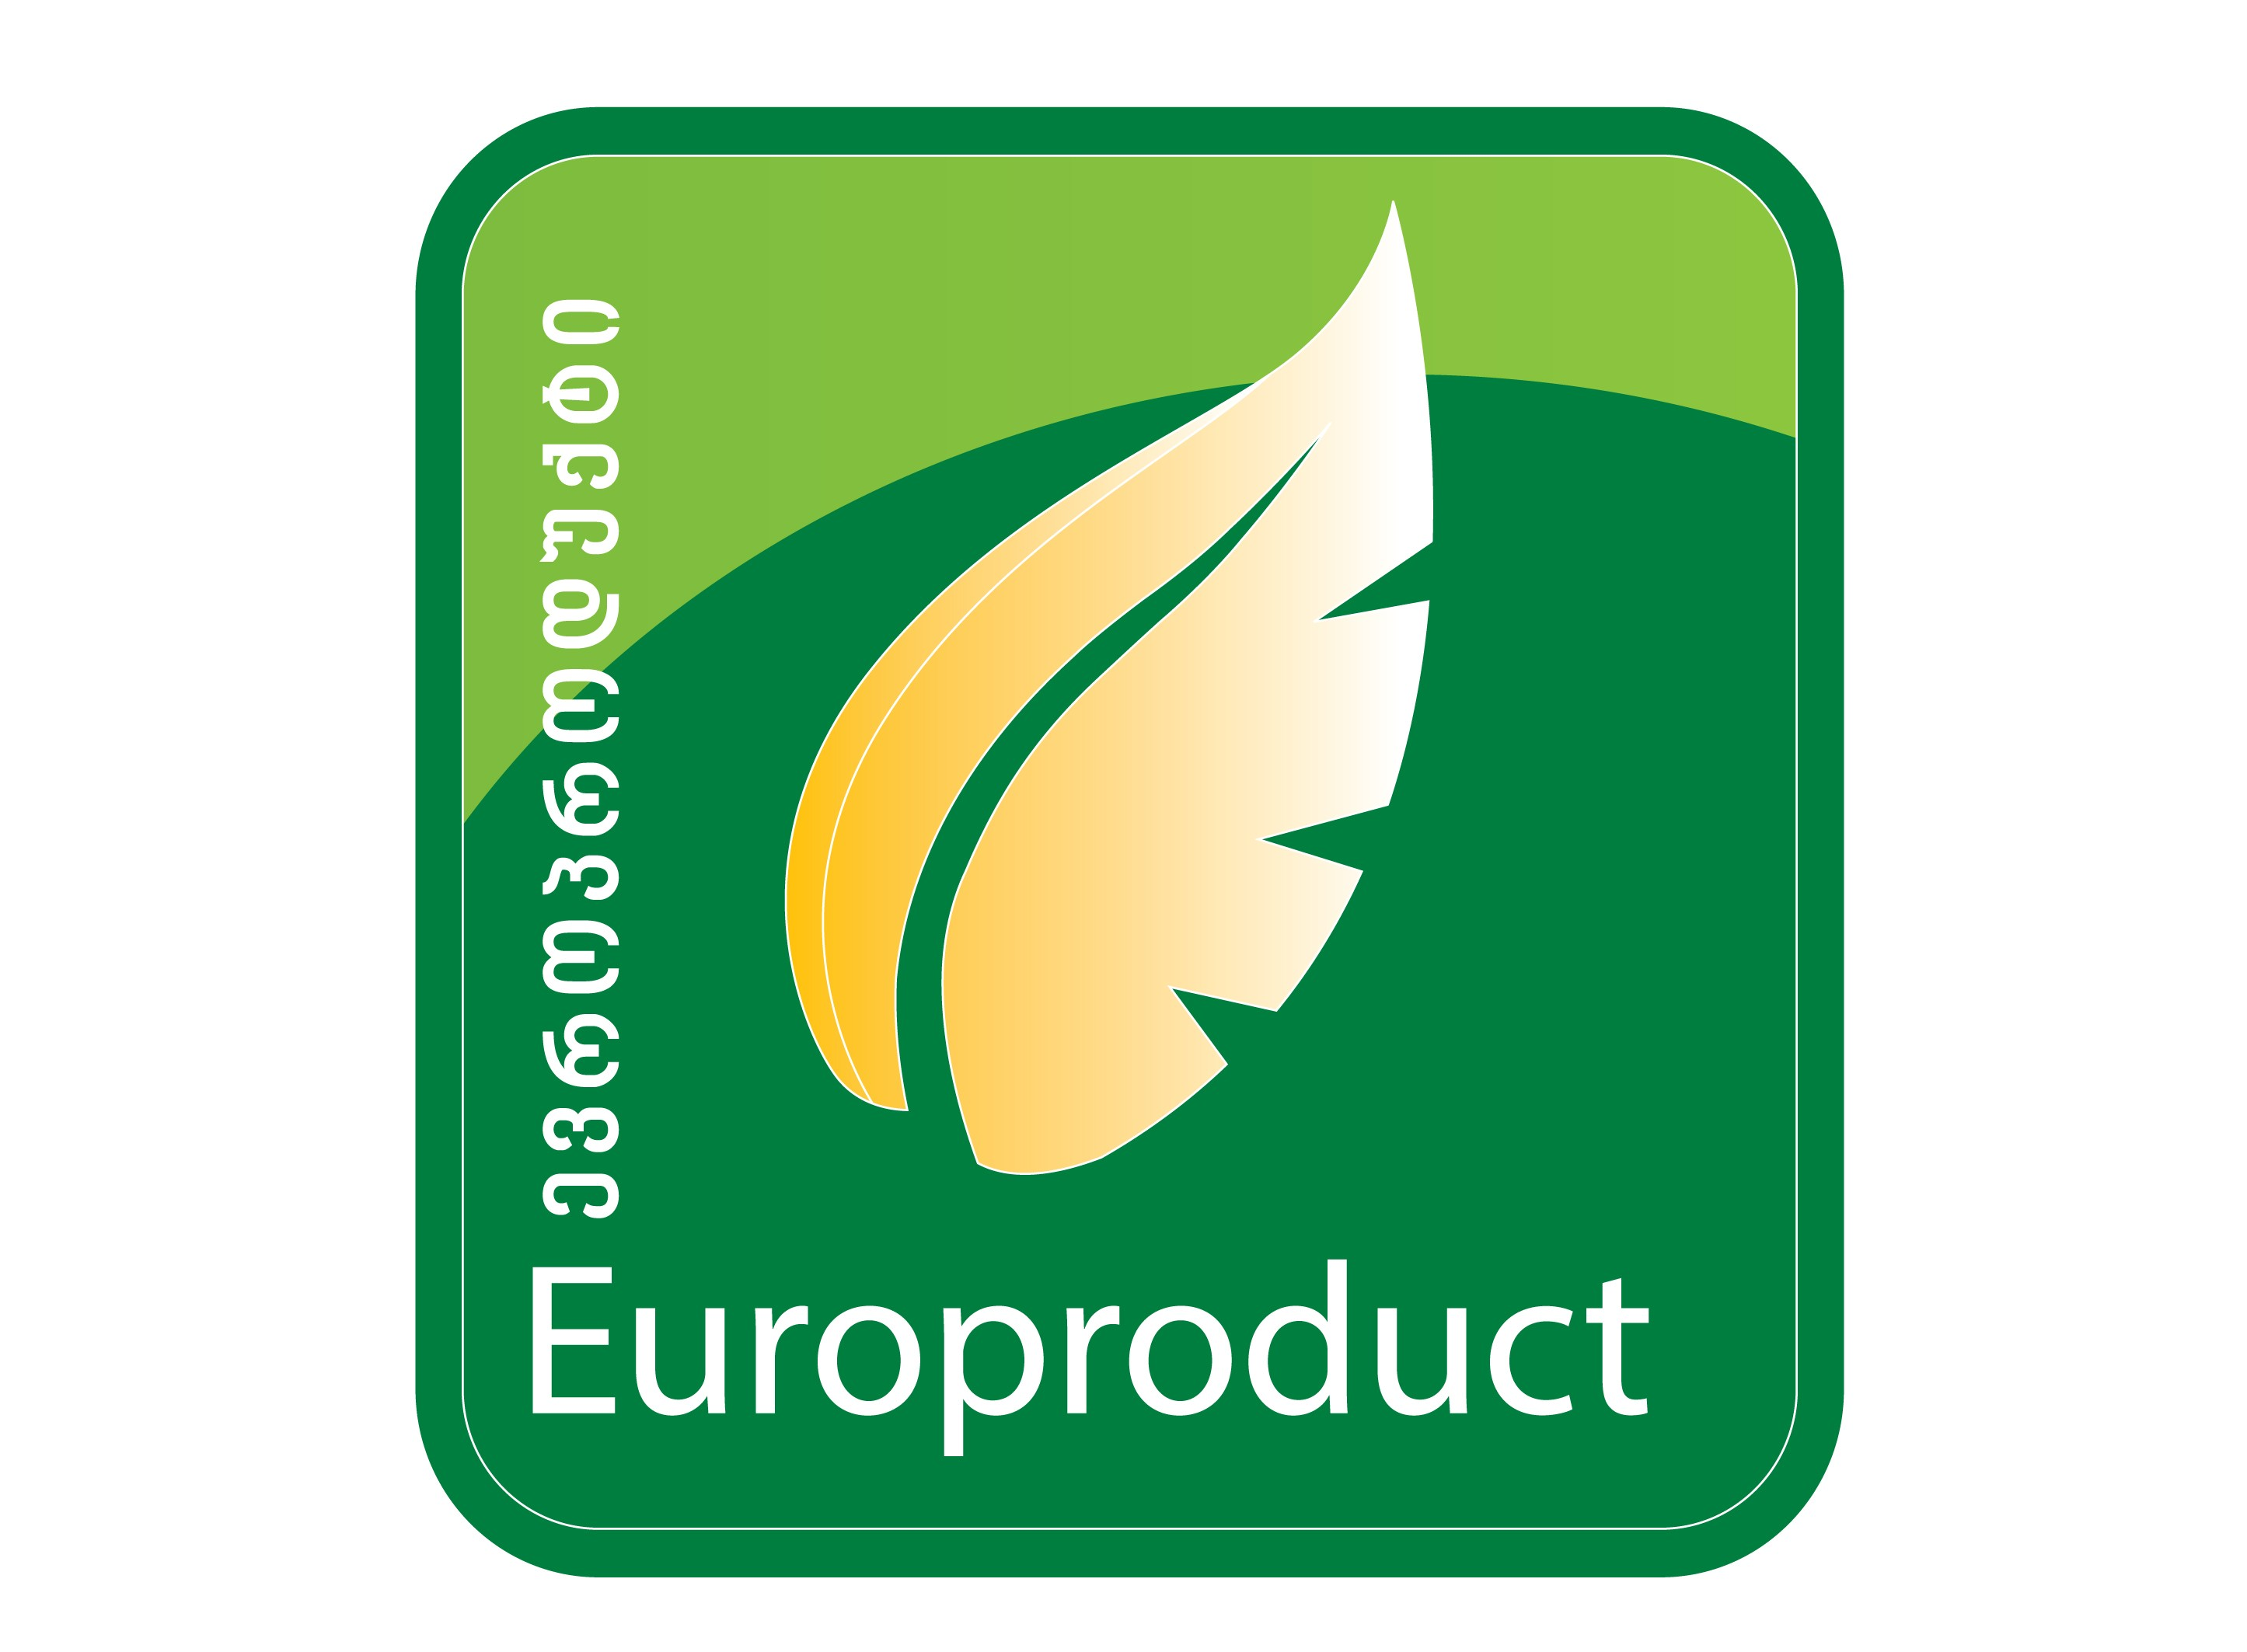 logo-europr